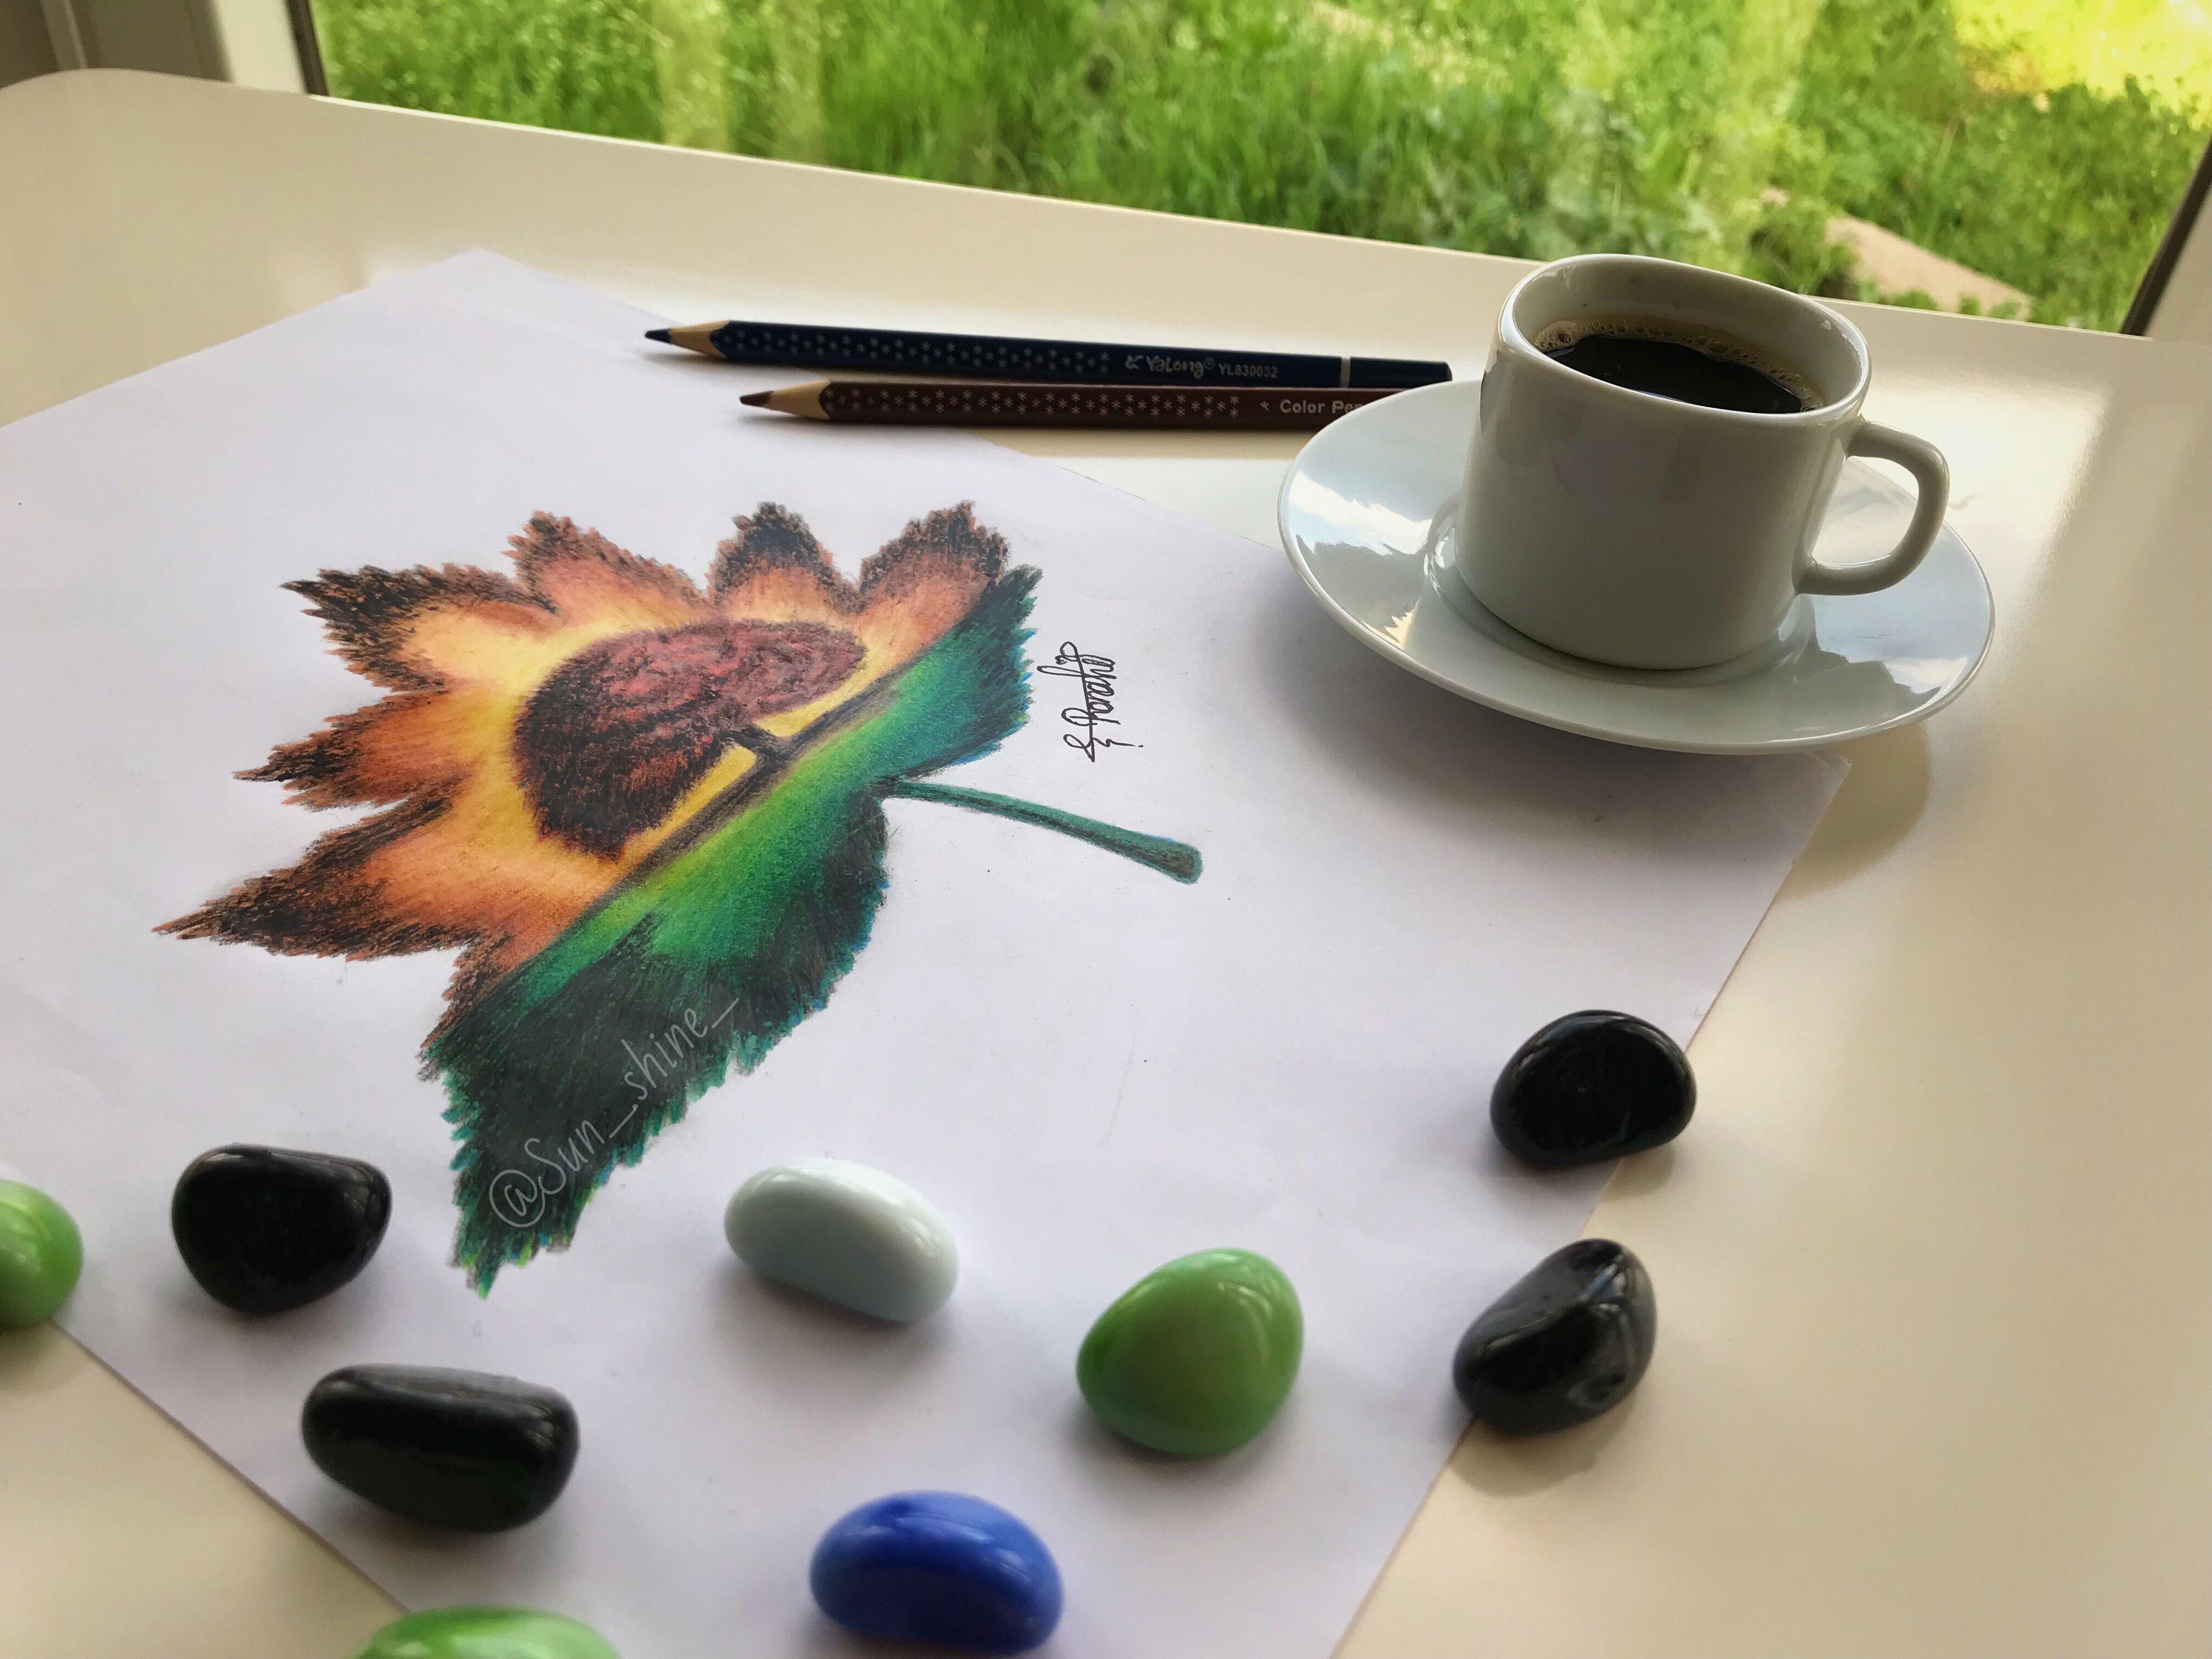 Sunshine اجعل علاقتك مع الناس كأوراق الشجر من يبقى يثمر ومن يسقط لايعود By Sunshine Mydrawing رسومات Drawin My Drawings Glassware Tableware